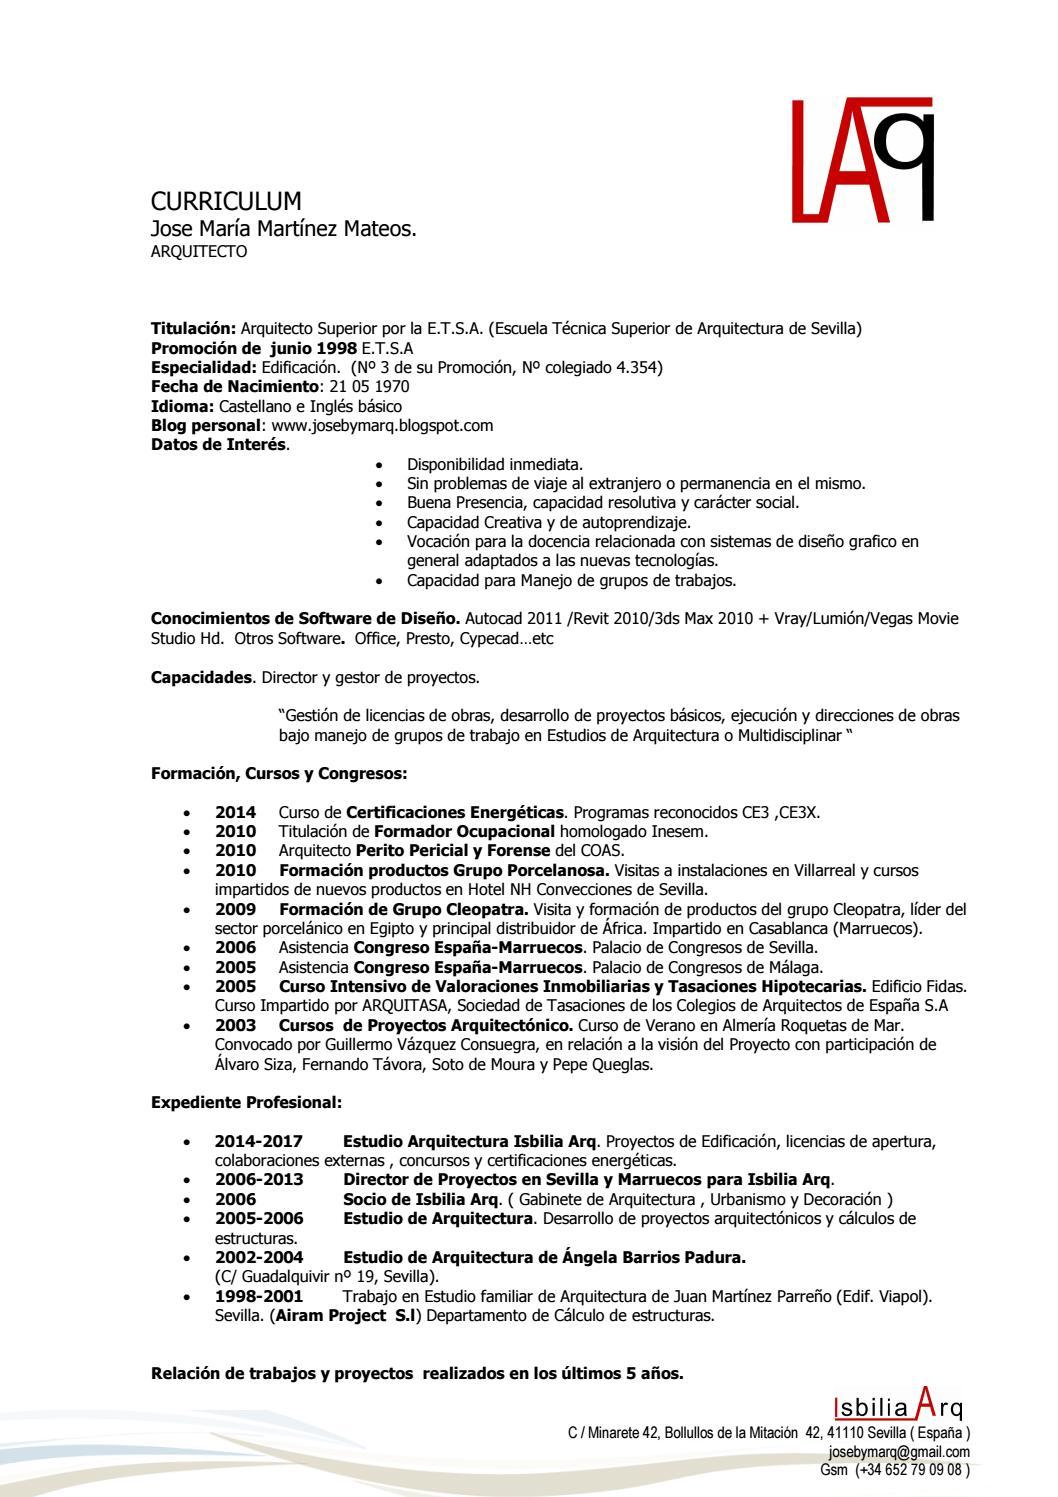 Curriculum octubre jmm 2017 ext by JOSE MARIA MARTINEZ MATEOS - issuu